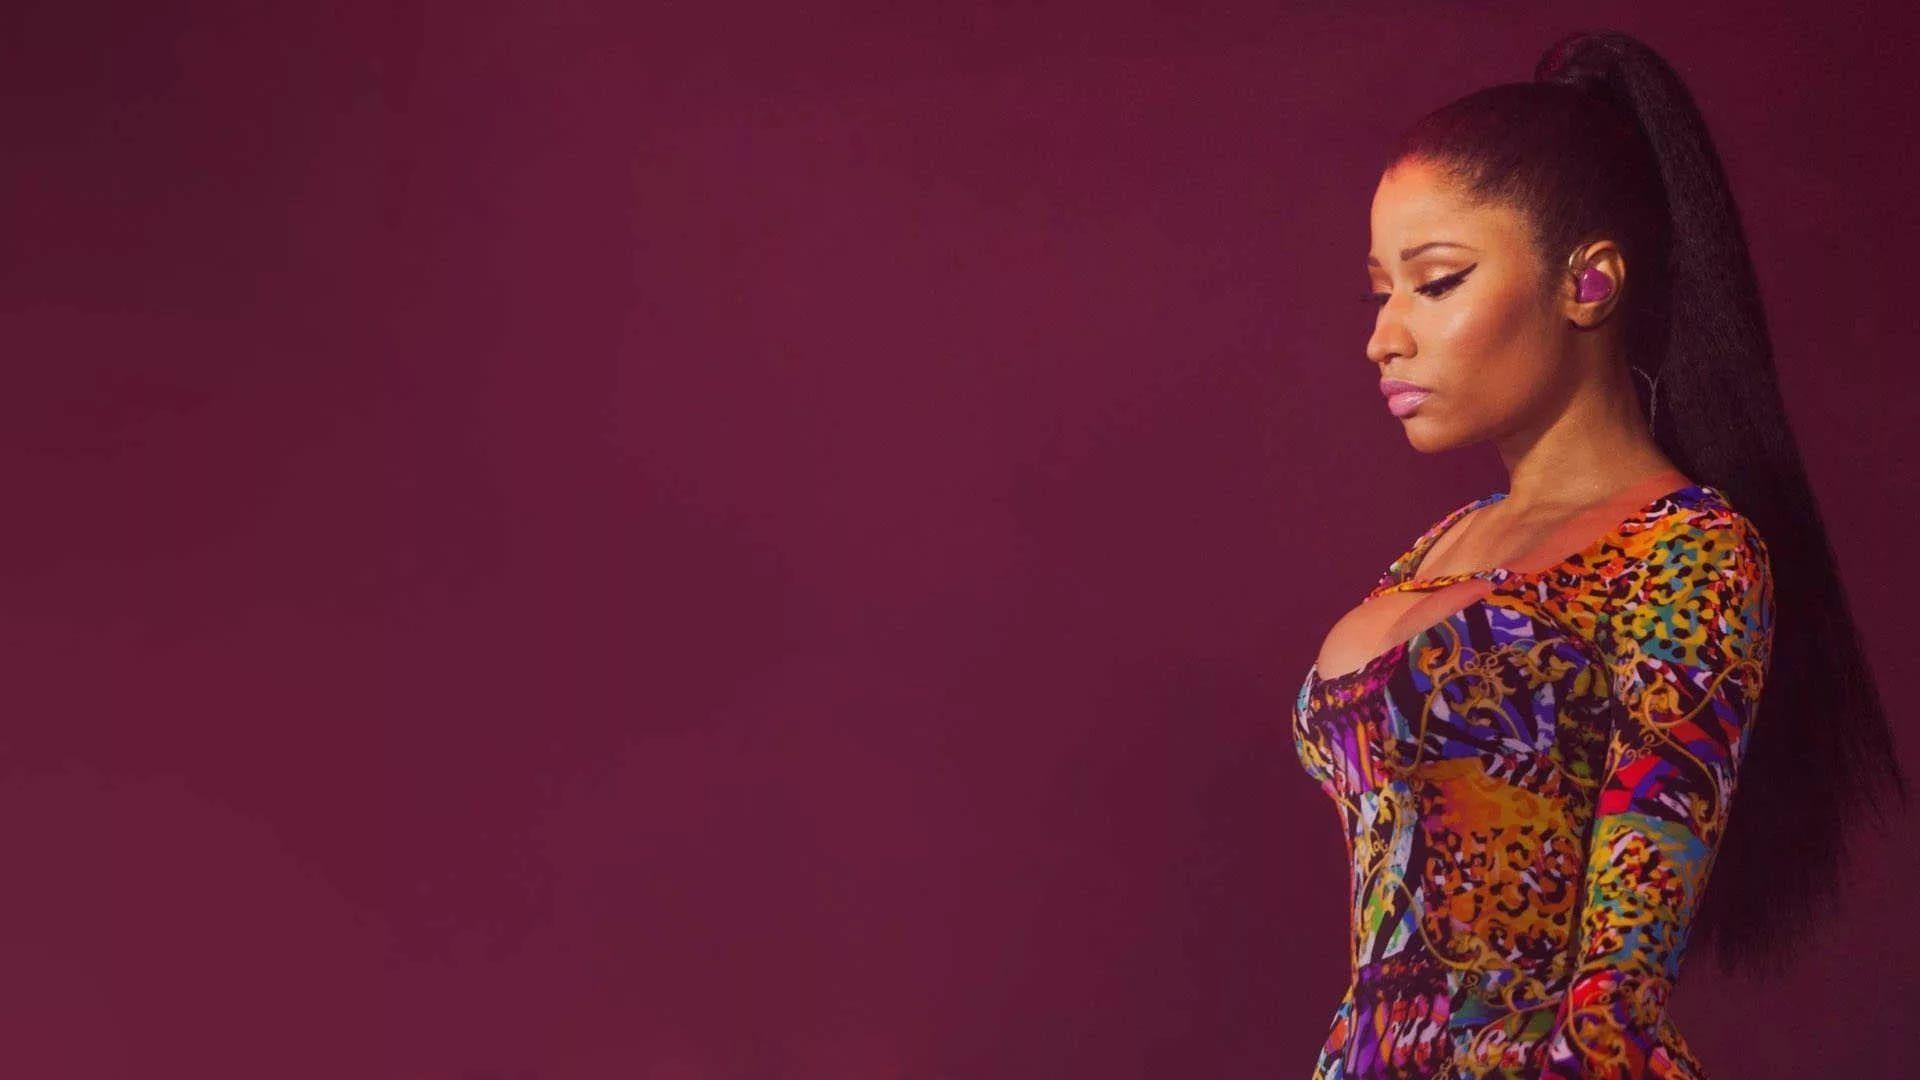 Nicki Minaj Free Desktop Wallpaper